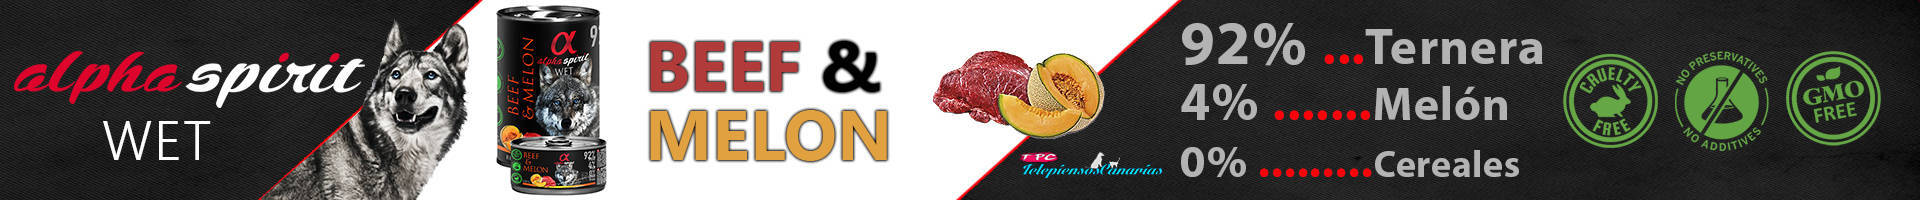 Alpha Spirit lata con 92% ternera y 4% de melón